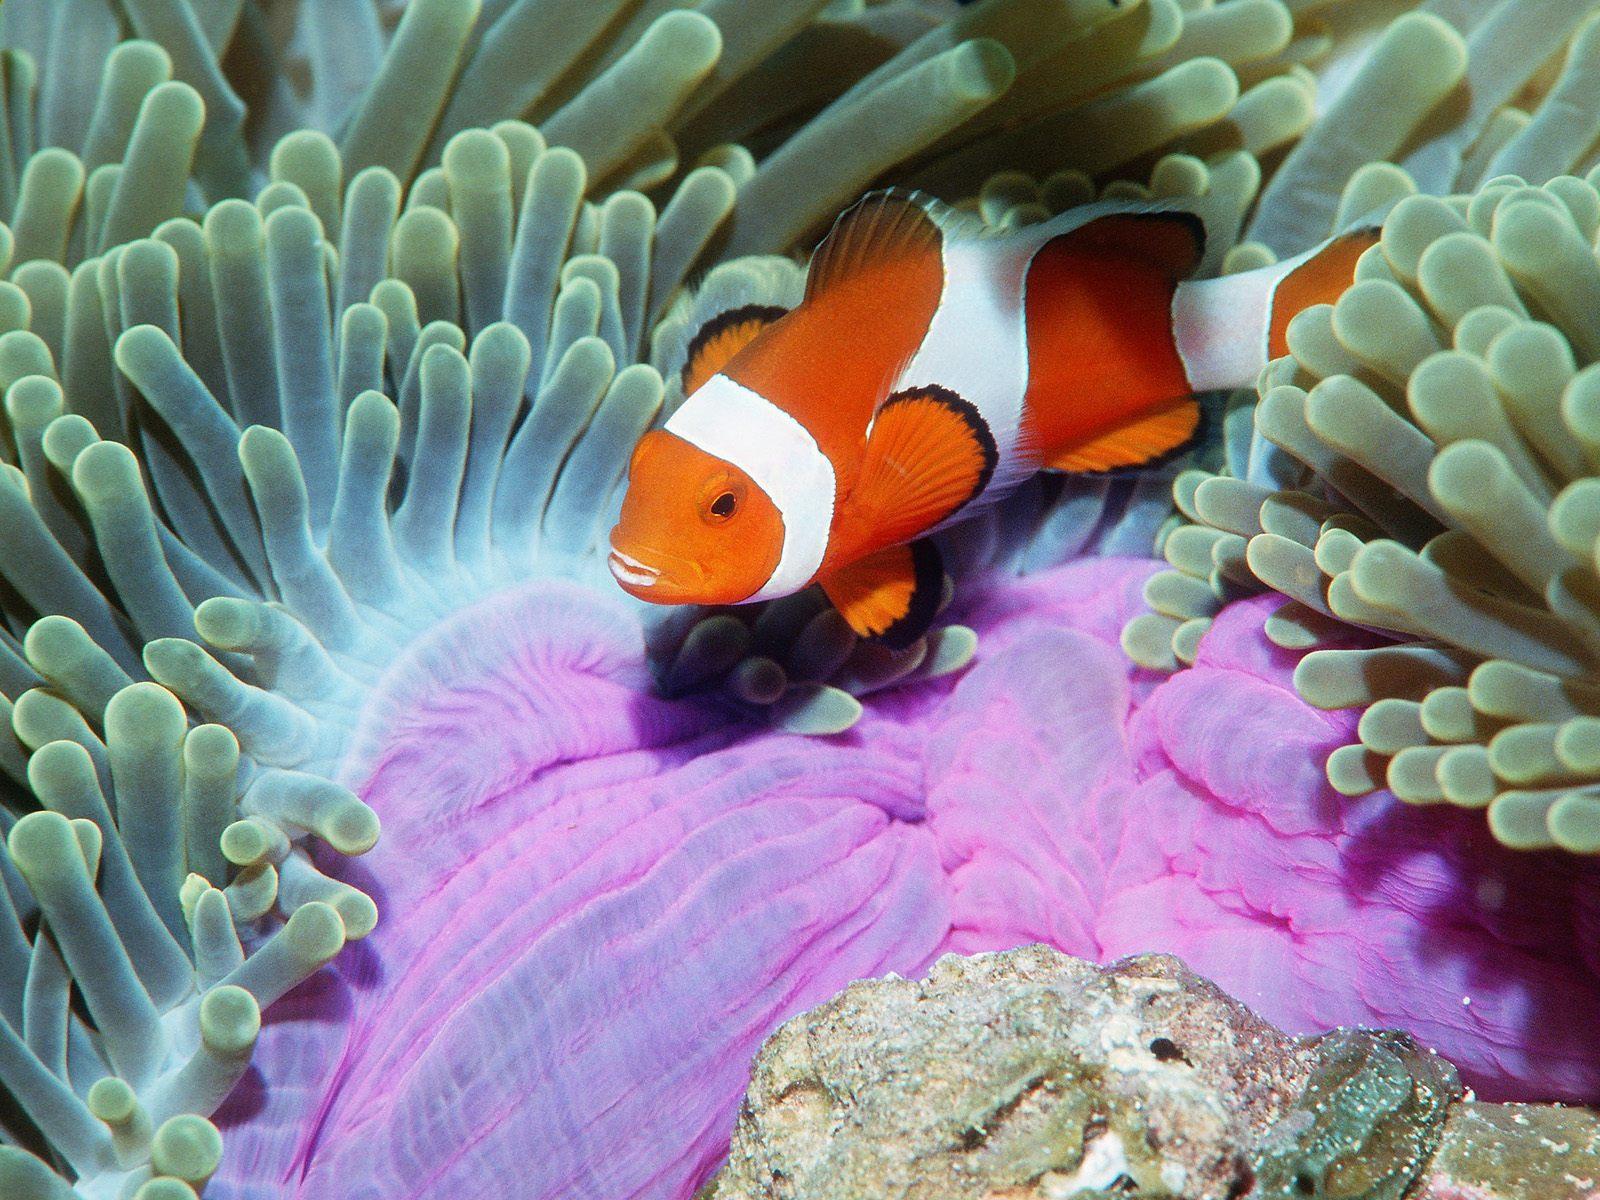 http://4.bp.blogspot.com/_sRGU_JXOz6E/TRXXnI7ZSeI/AAAAAAAAAbw/cOR51lt-ZvY/s1600/Underwater%2BWallpaper%2B%25252897%252529.jpg